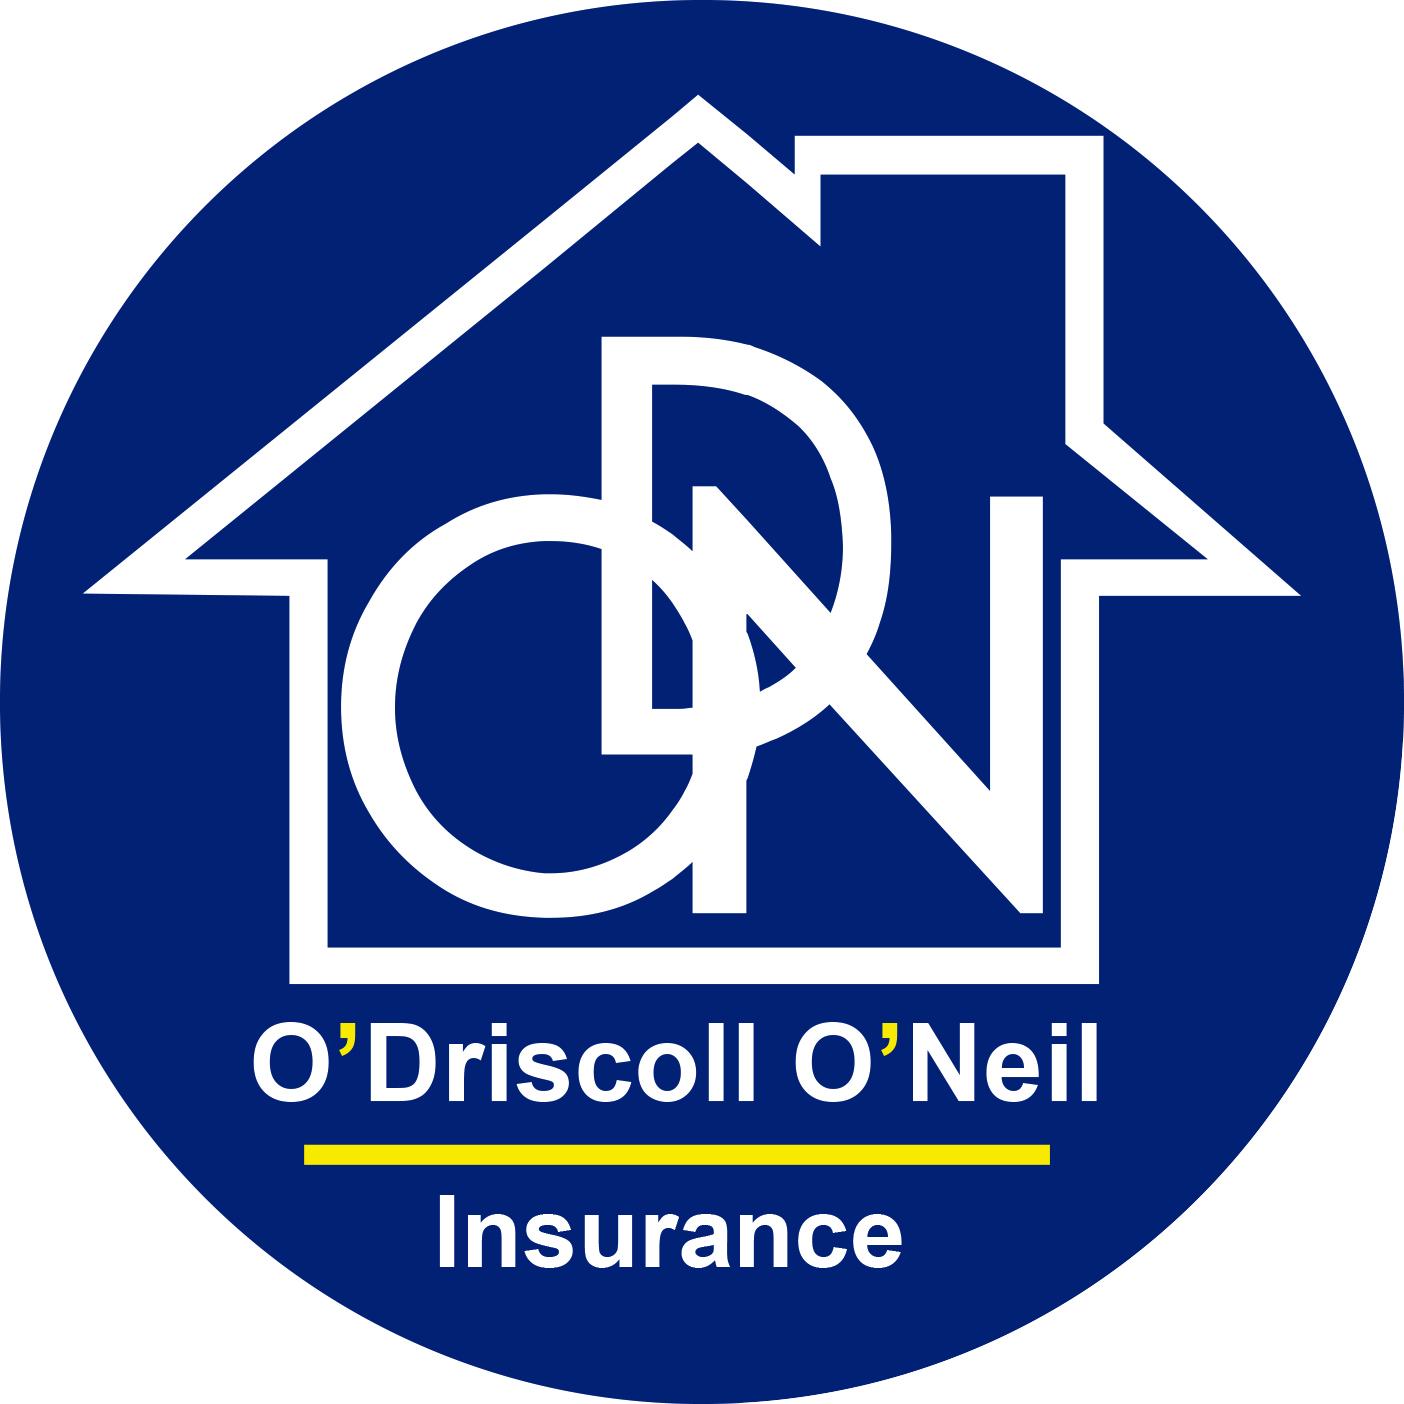 O'Driscoll O'Neil